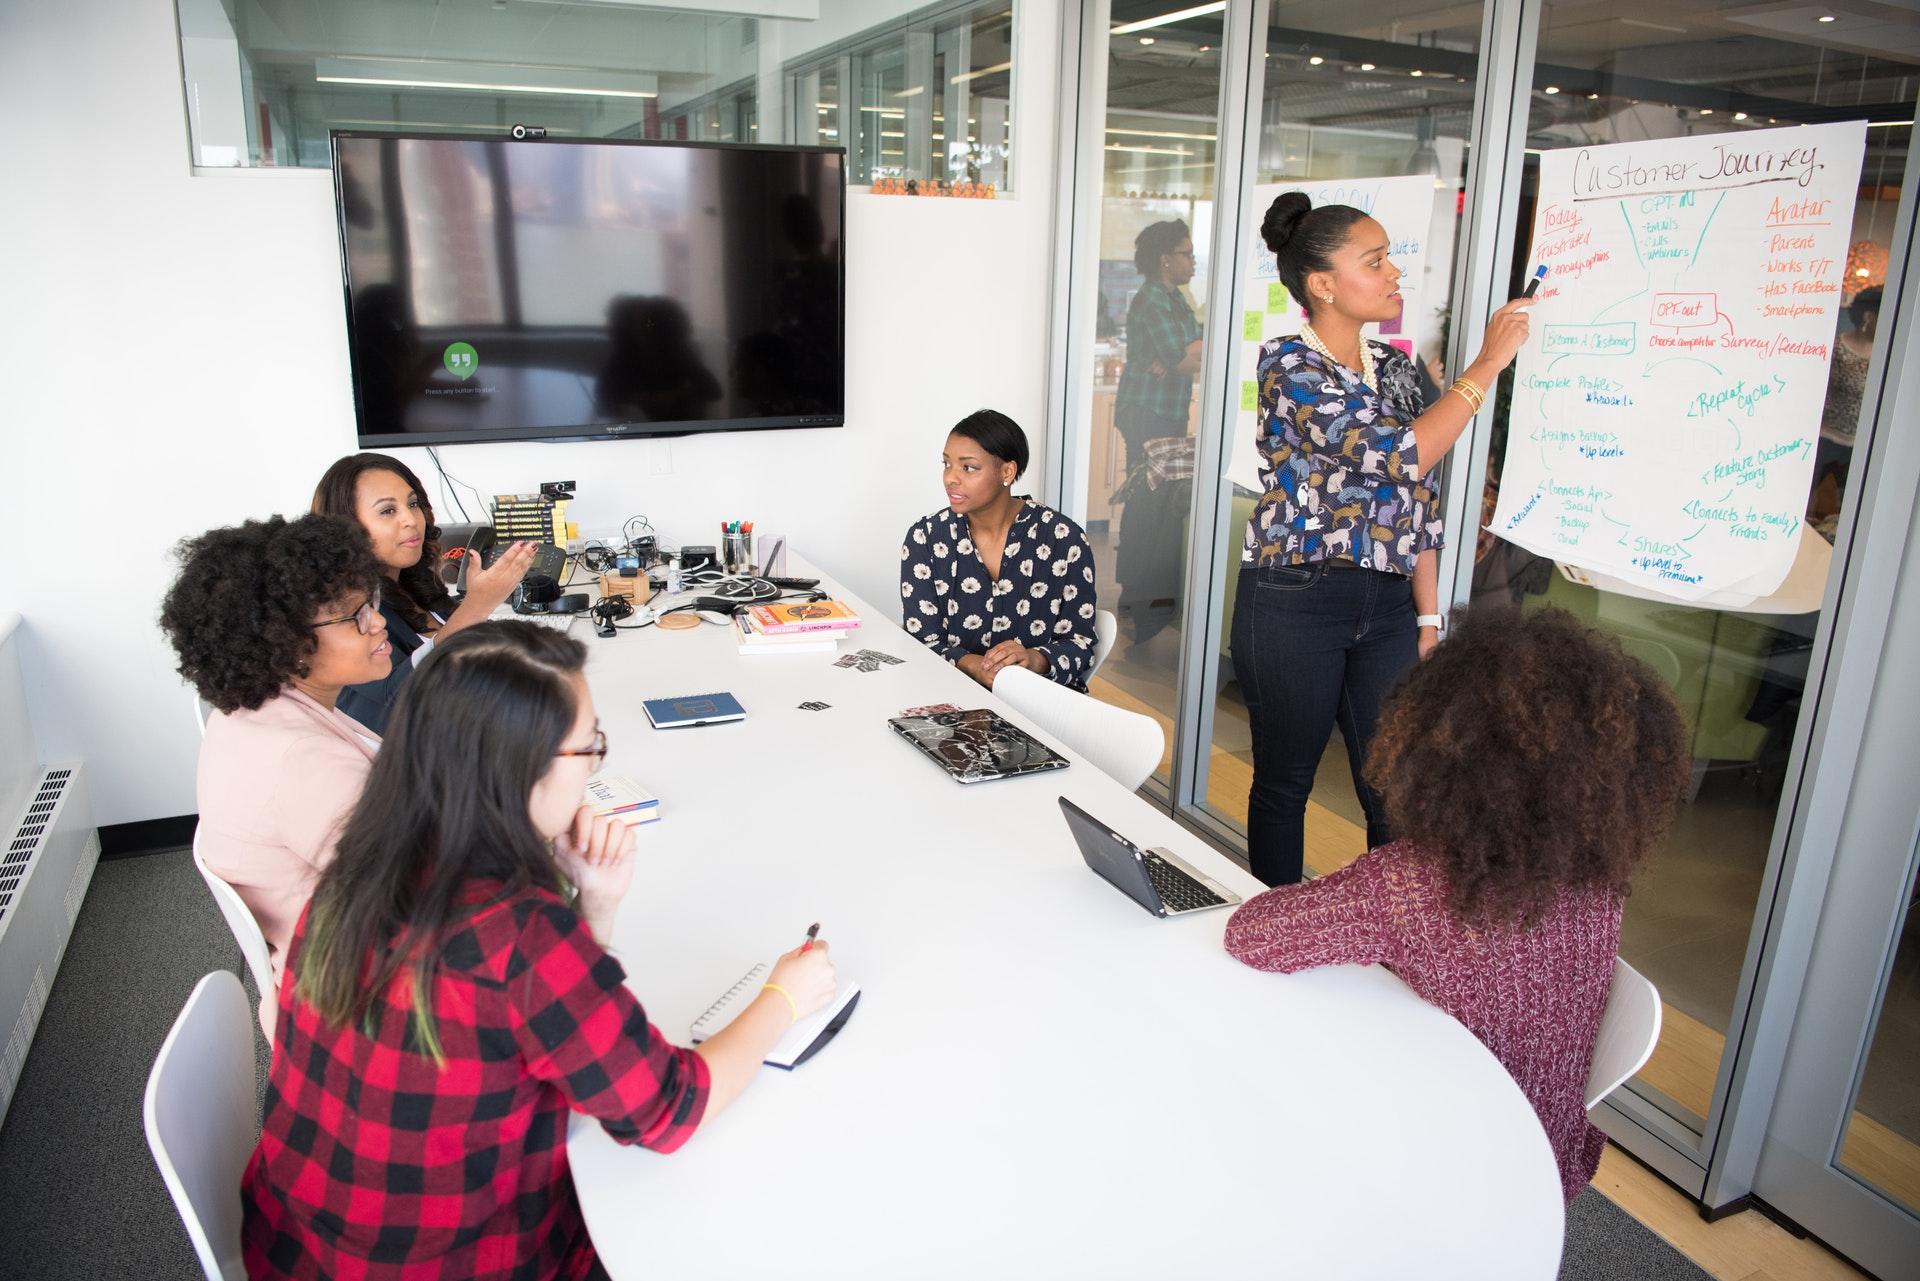 Creating a Peer-Led Study Program in STEM